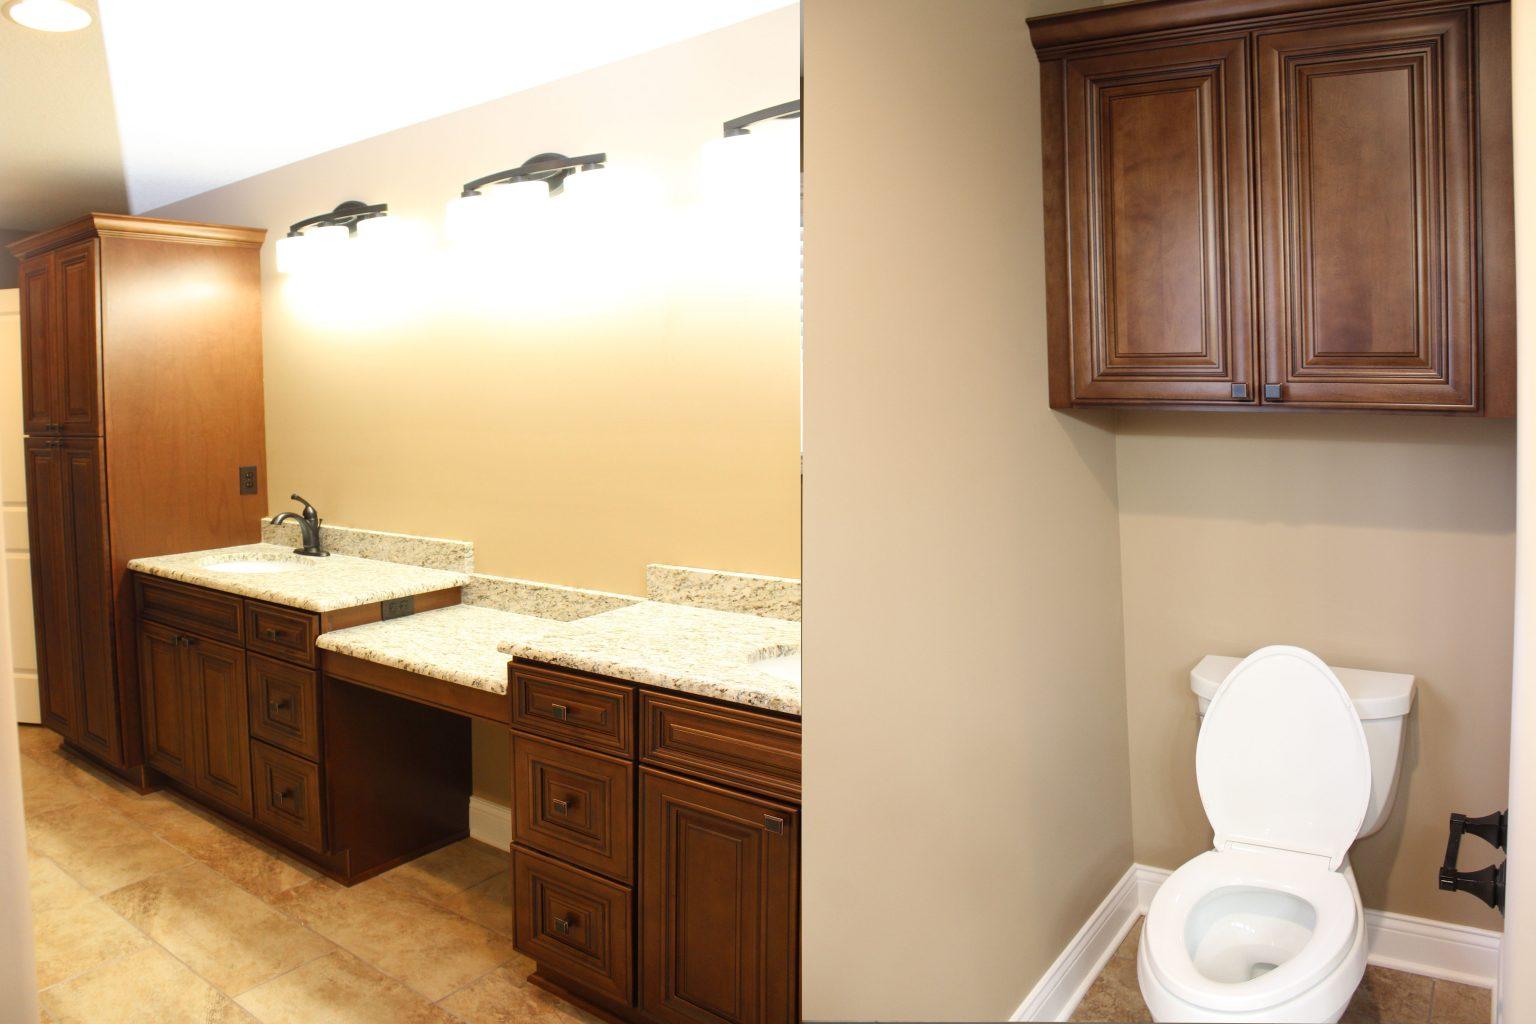 vanity-toilet